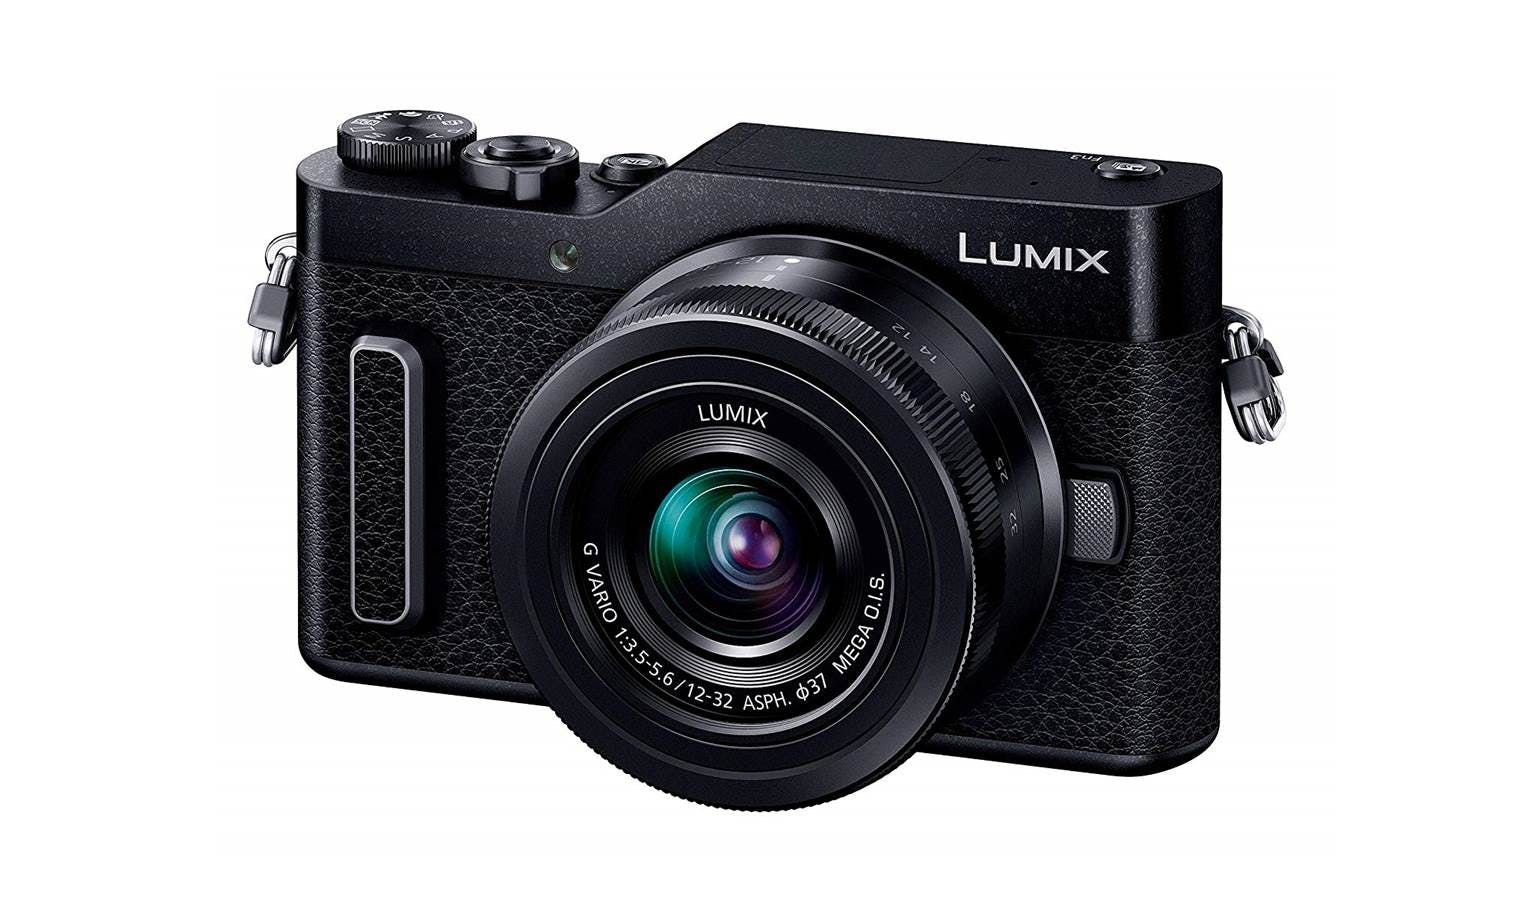 Panasonic Lumix DC-GF10 Mirrorless Camera Double Lens Kit (12-32 mm +  35-100 mm) - Black